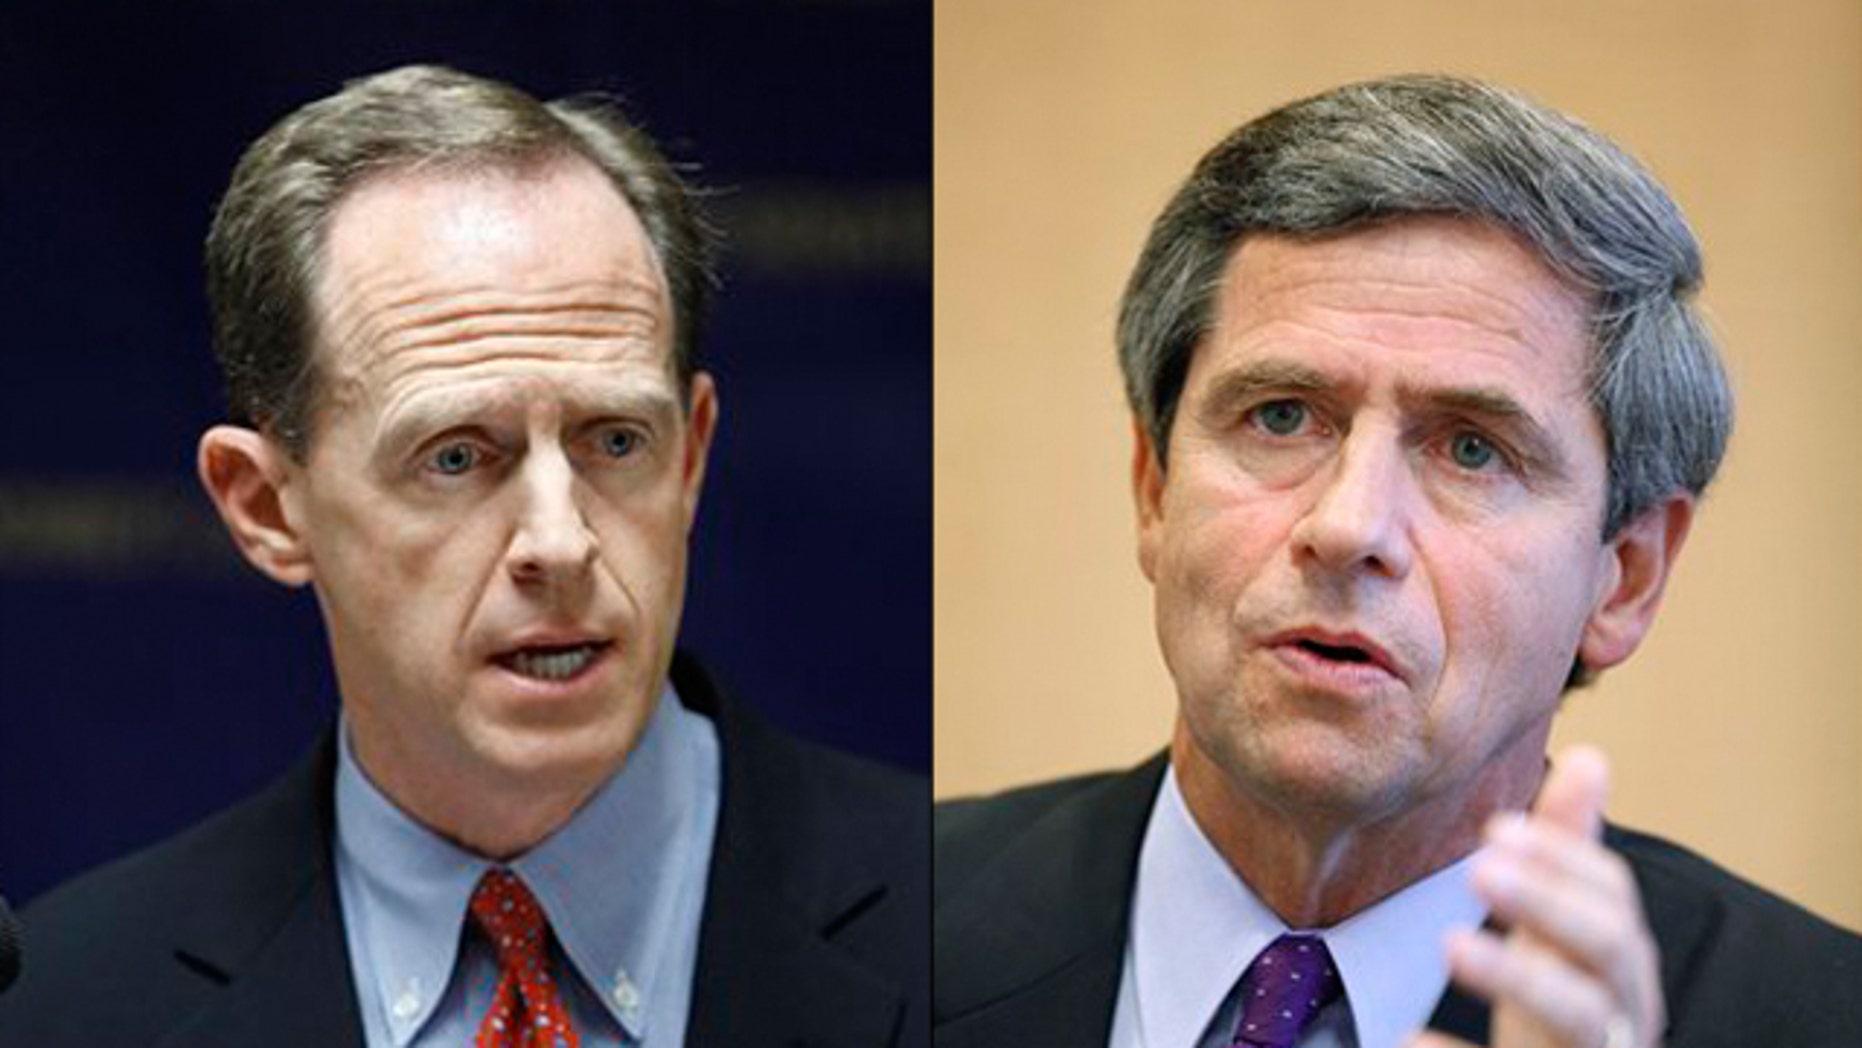 Shown here are Pennsylvania Senate candidates Pat Toomey, left, and Rep. Joe Sestak. (AP Photos)